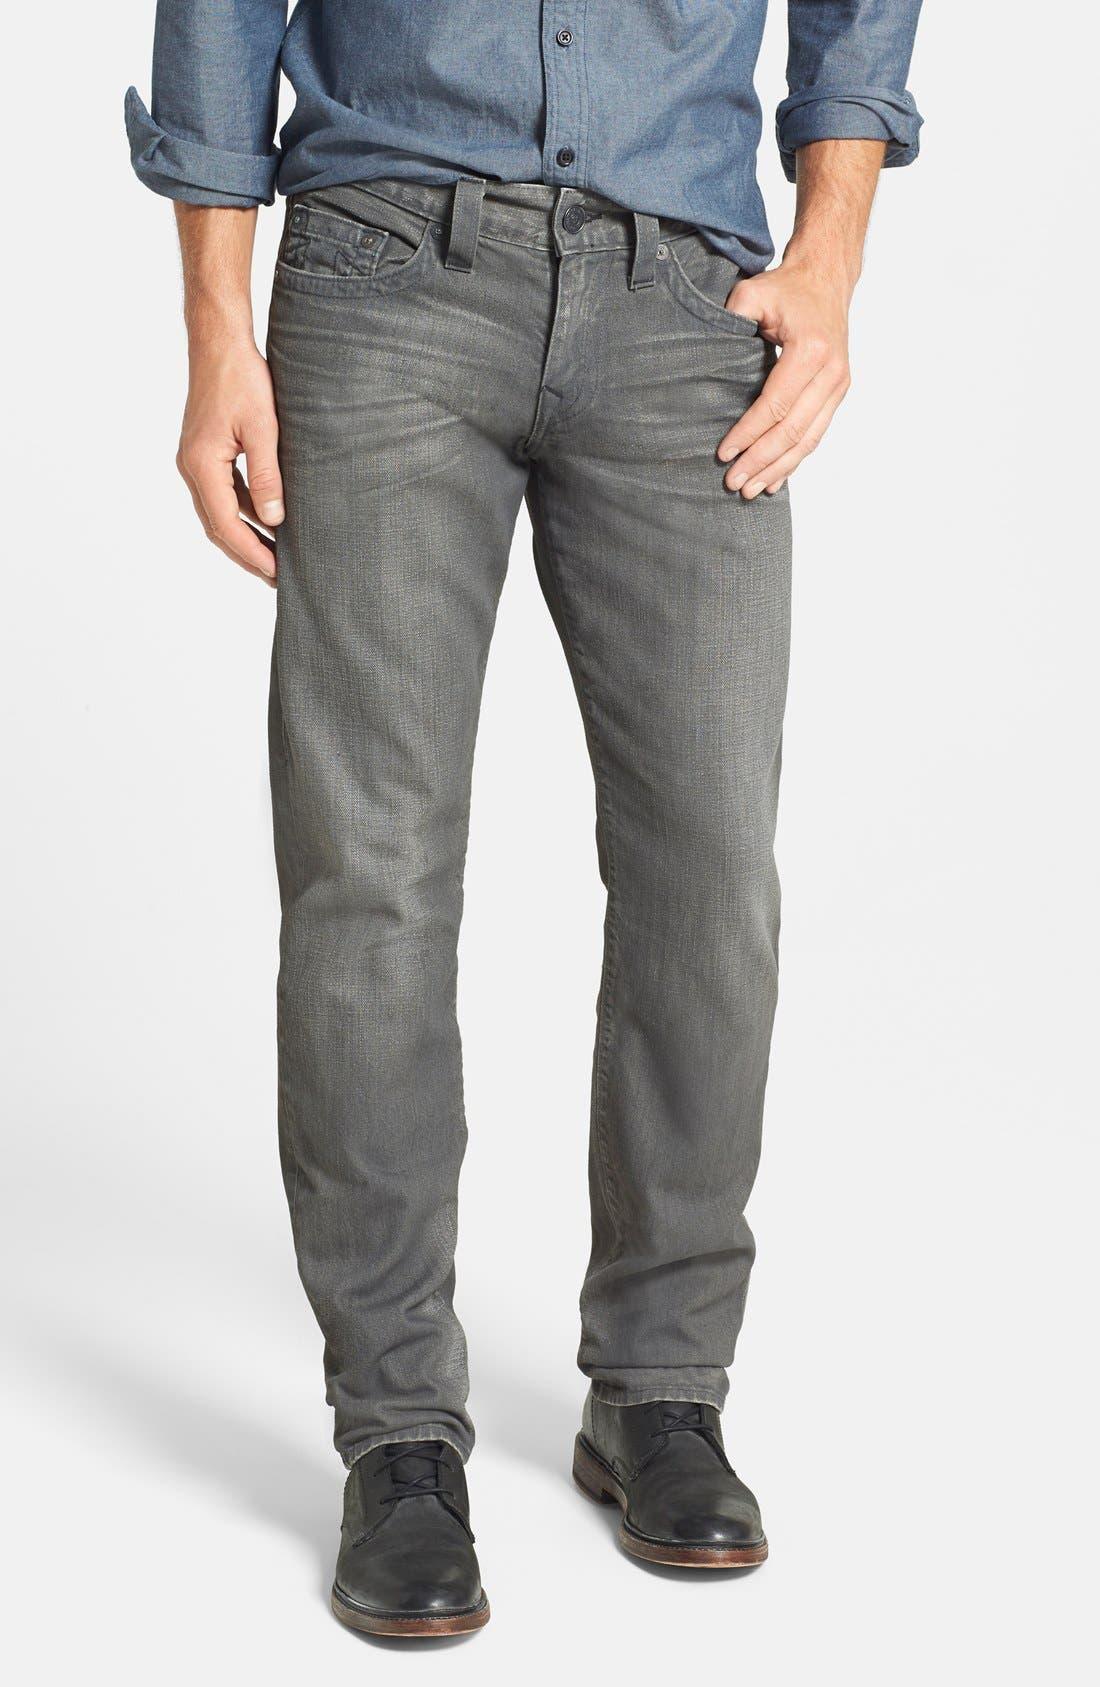 Main Image - True Religion Brand Jeans 'Geno' Straight Leg Jeans (Concrete Hill)